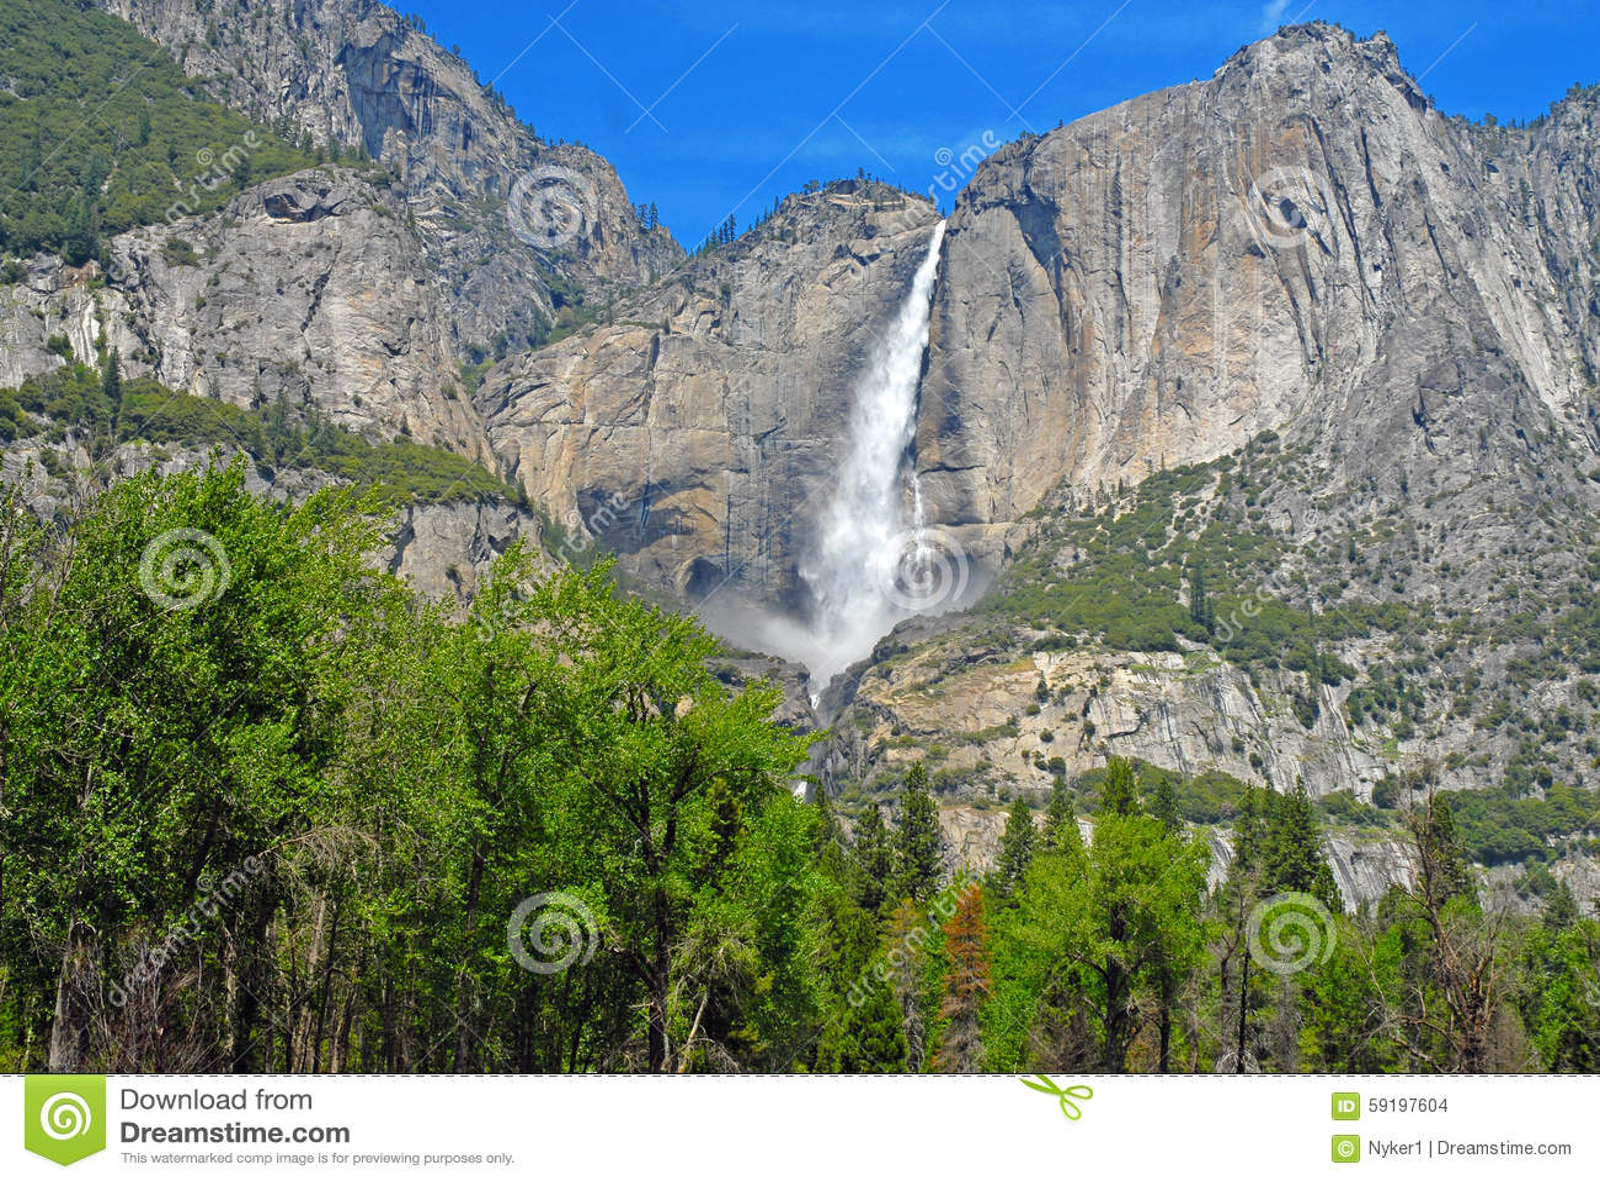 Alpine Park Alpine Scene In Yosemite National Park Sierra Nevada Mountains